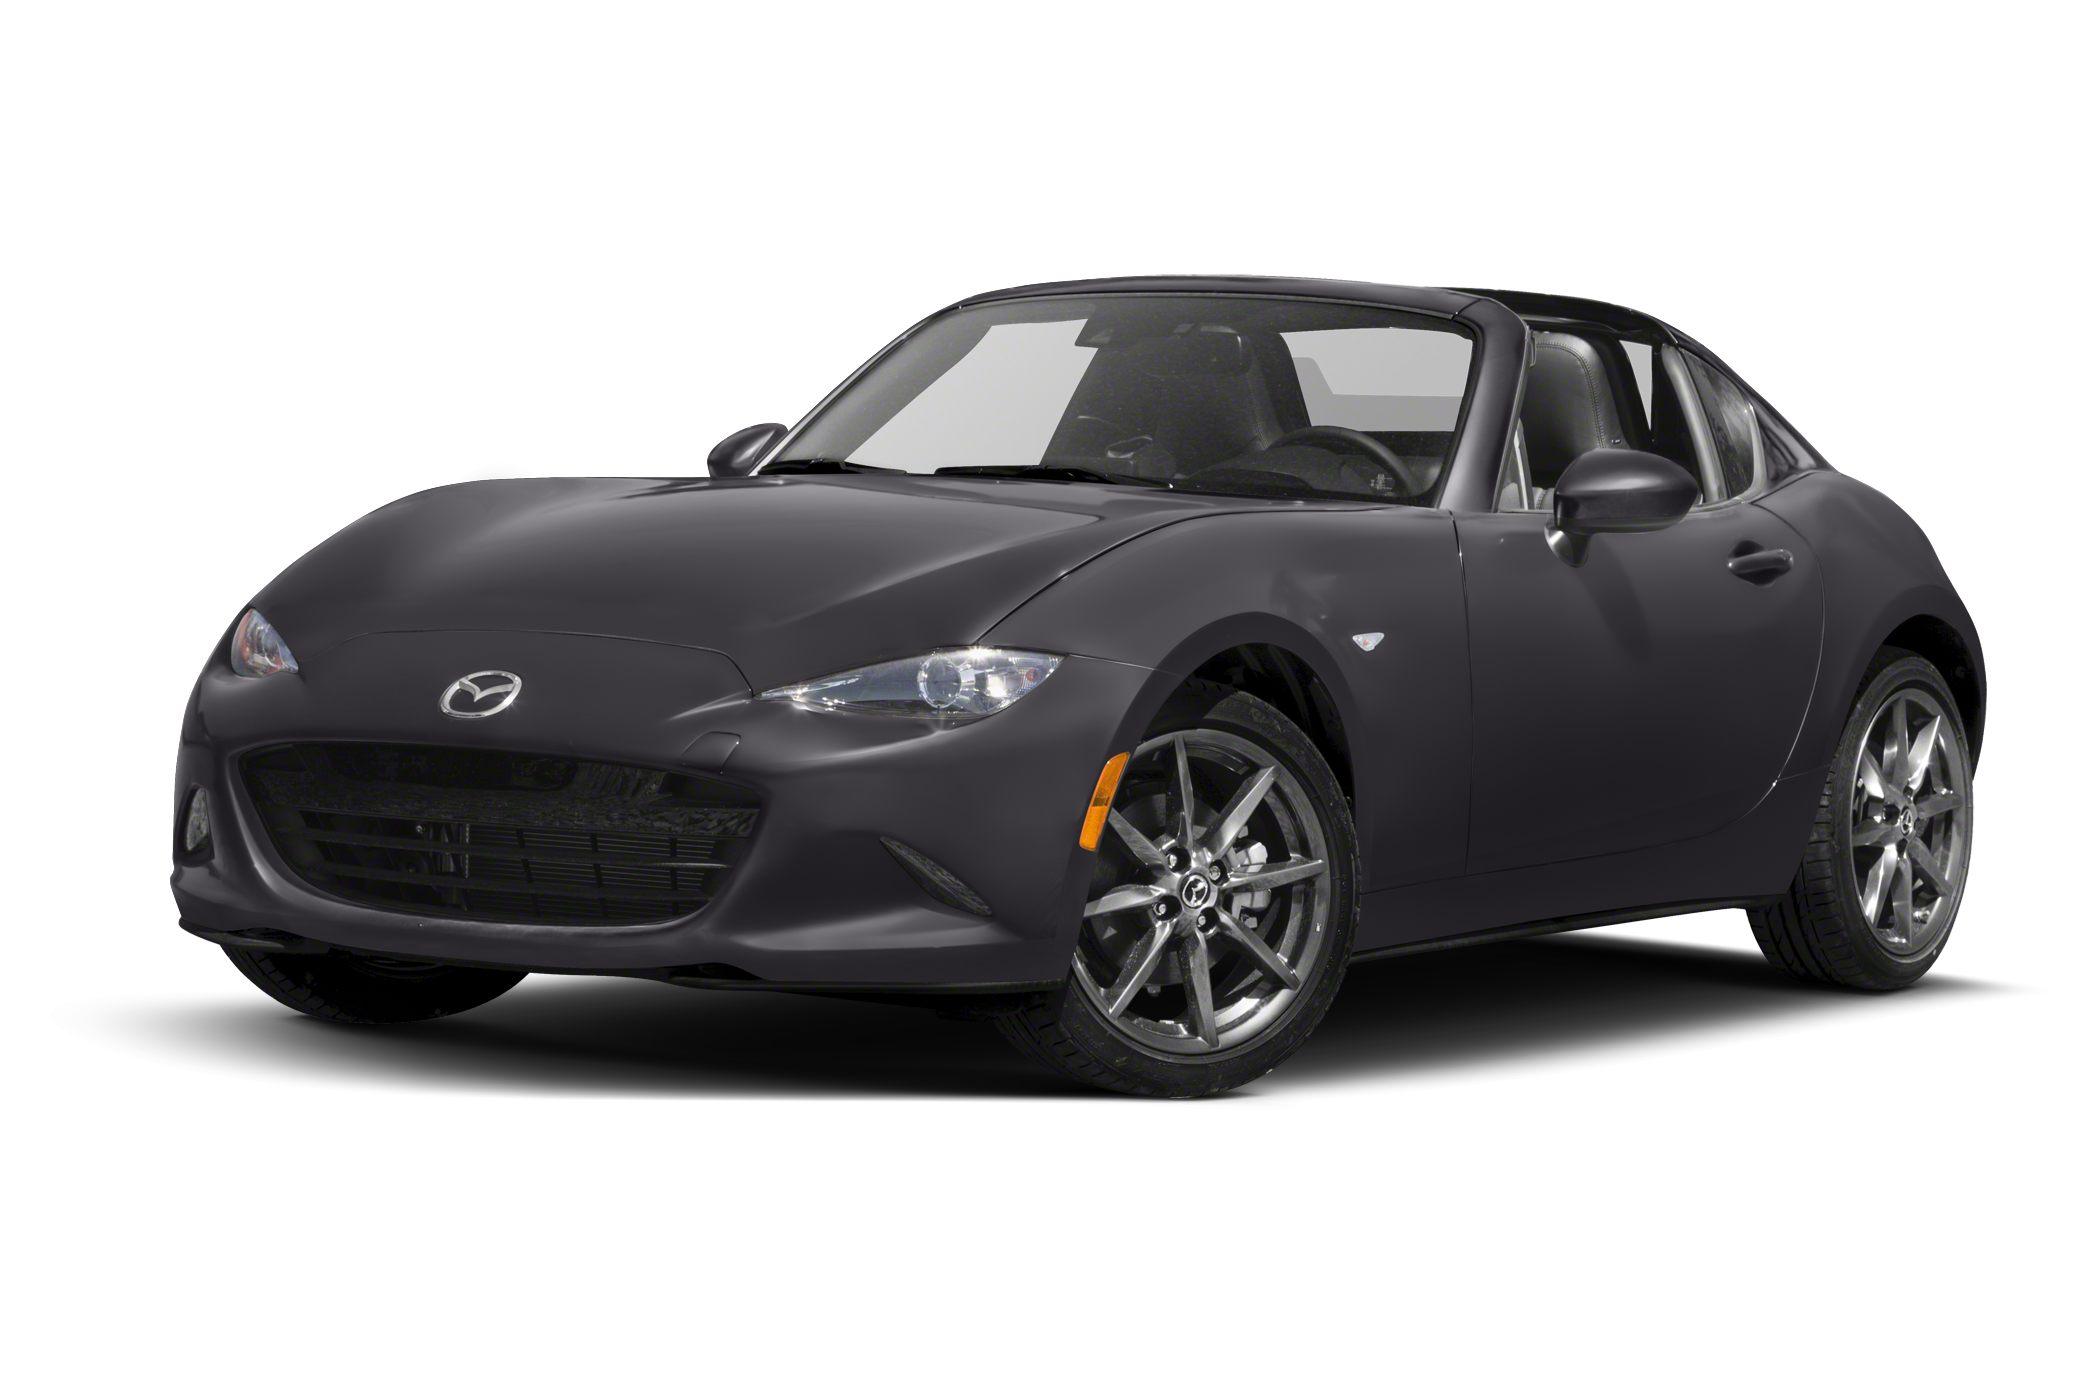 2018 Mazda Mx 5 Miata Specs Safety Rating Mpg Carsdirect